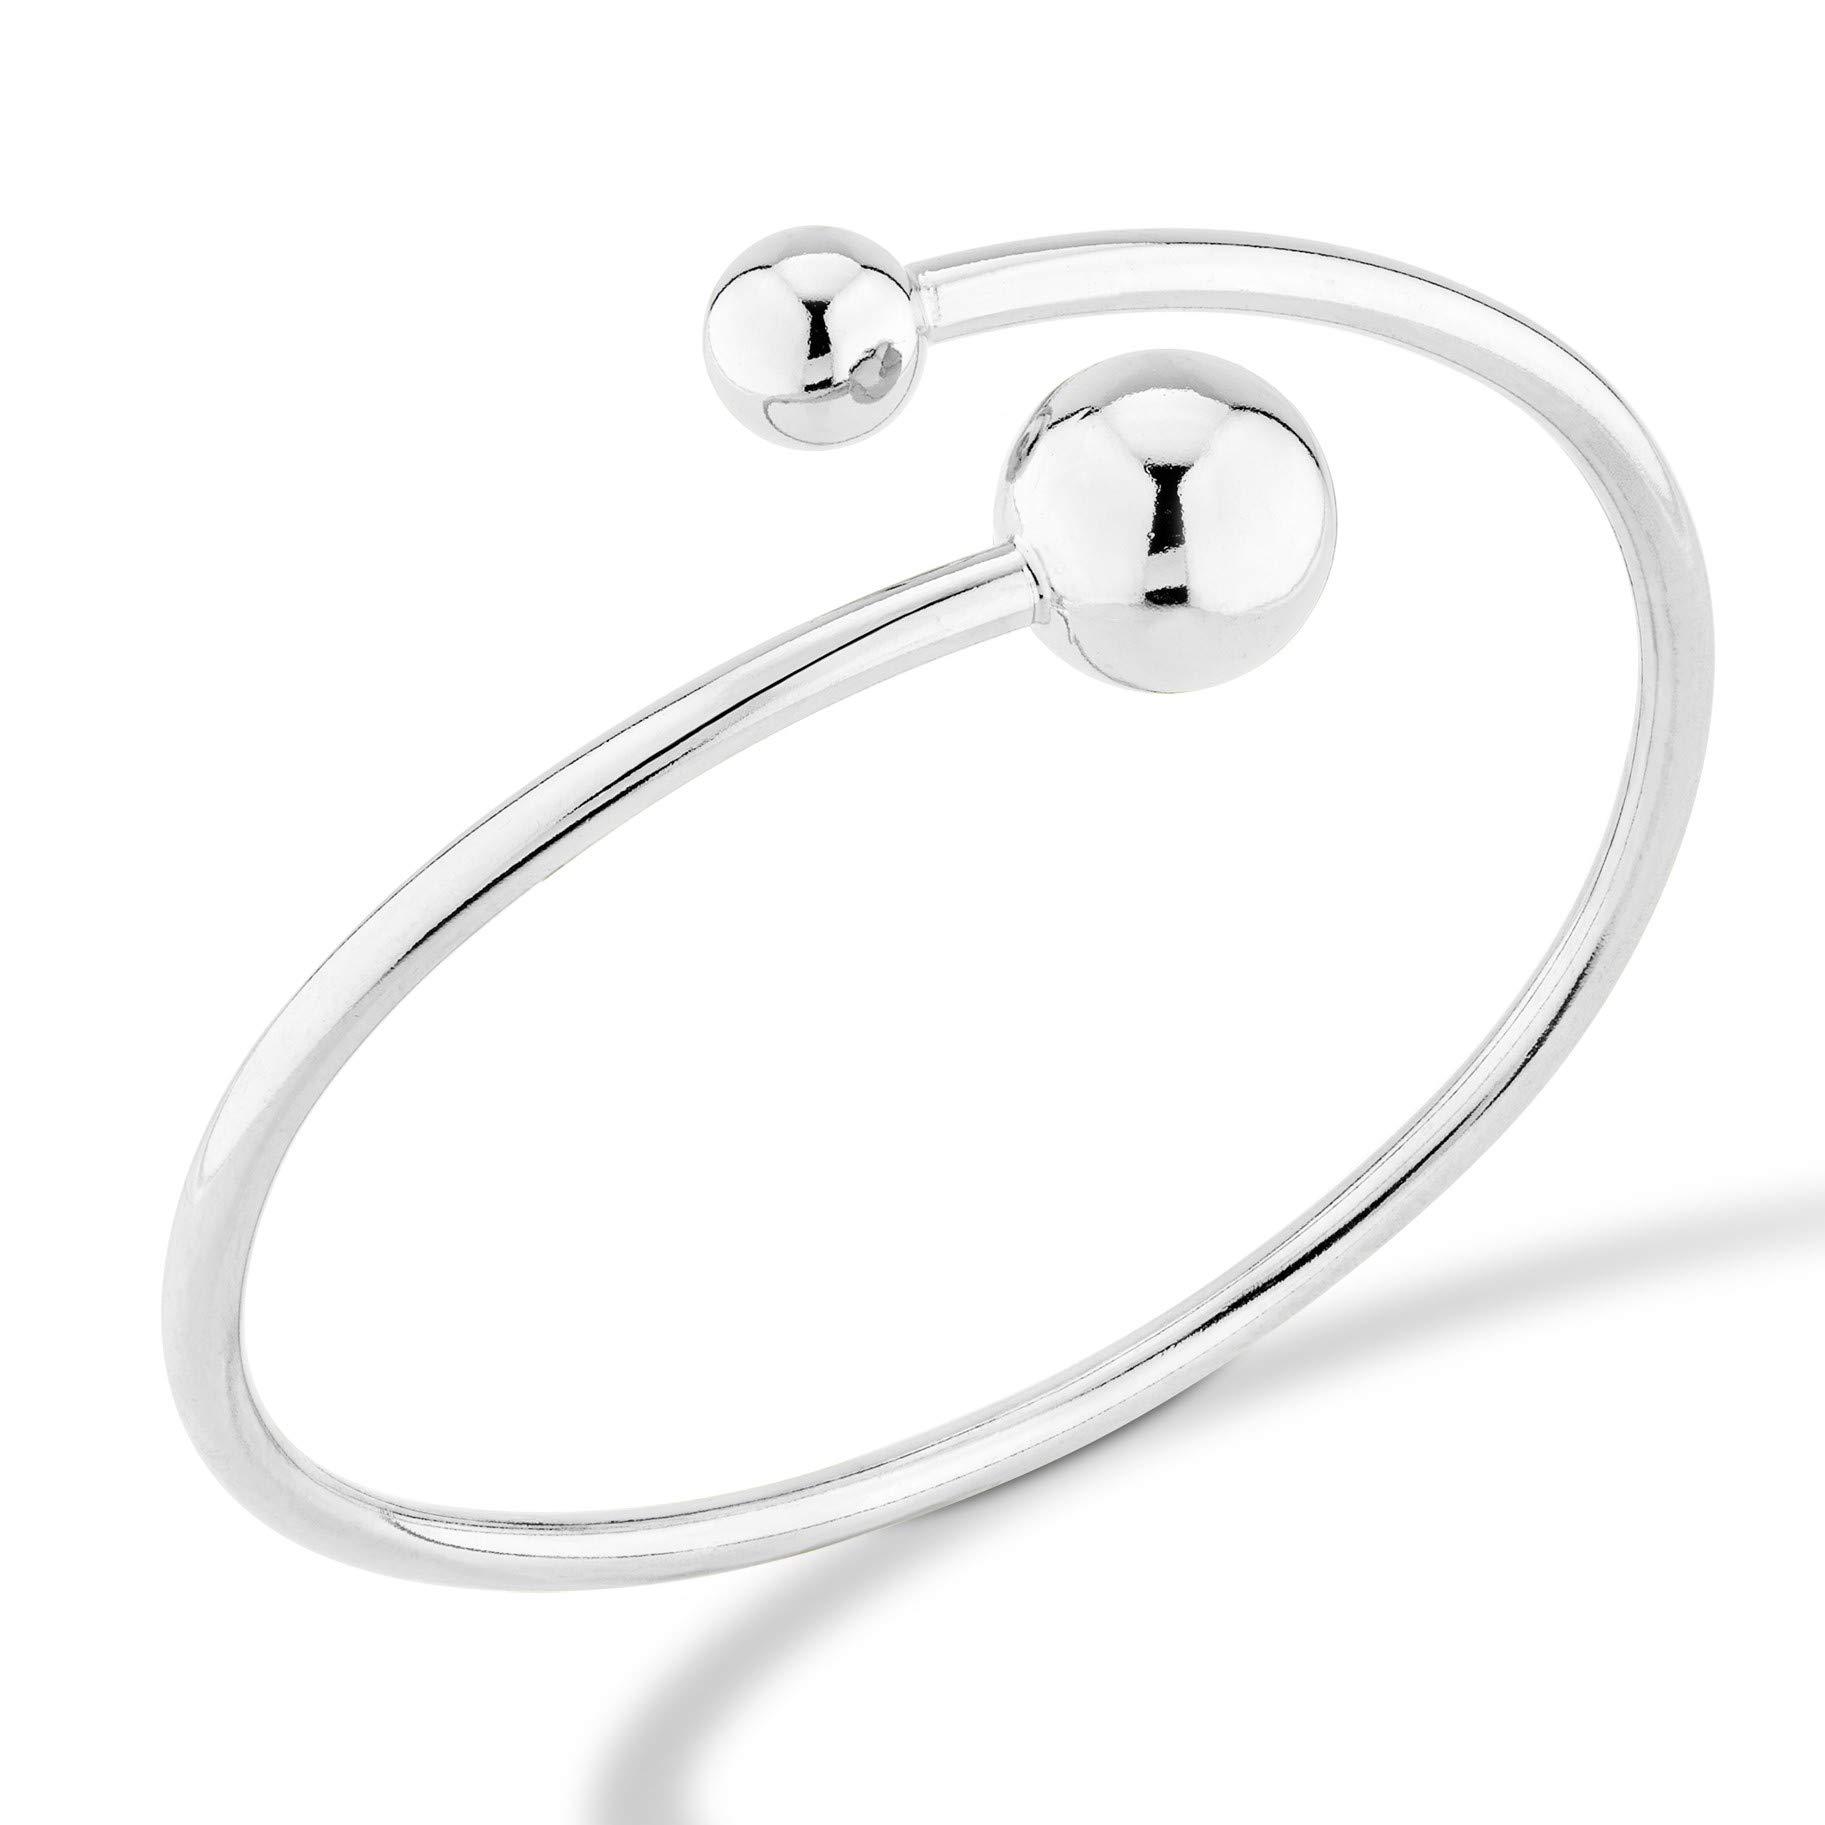 MiaBella 925 Sterling Silver Italian Flexible Bypass Bead Ball Bangle Bracelet Jewelry Women 7'' 7.5'' 8'' (Large (7.75'' to 8''))